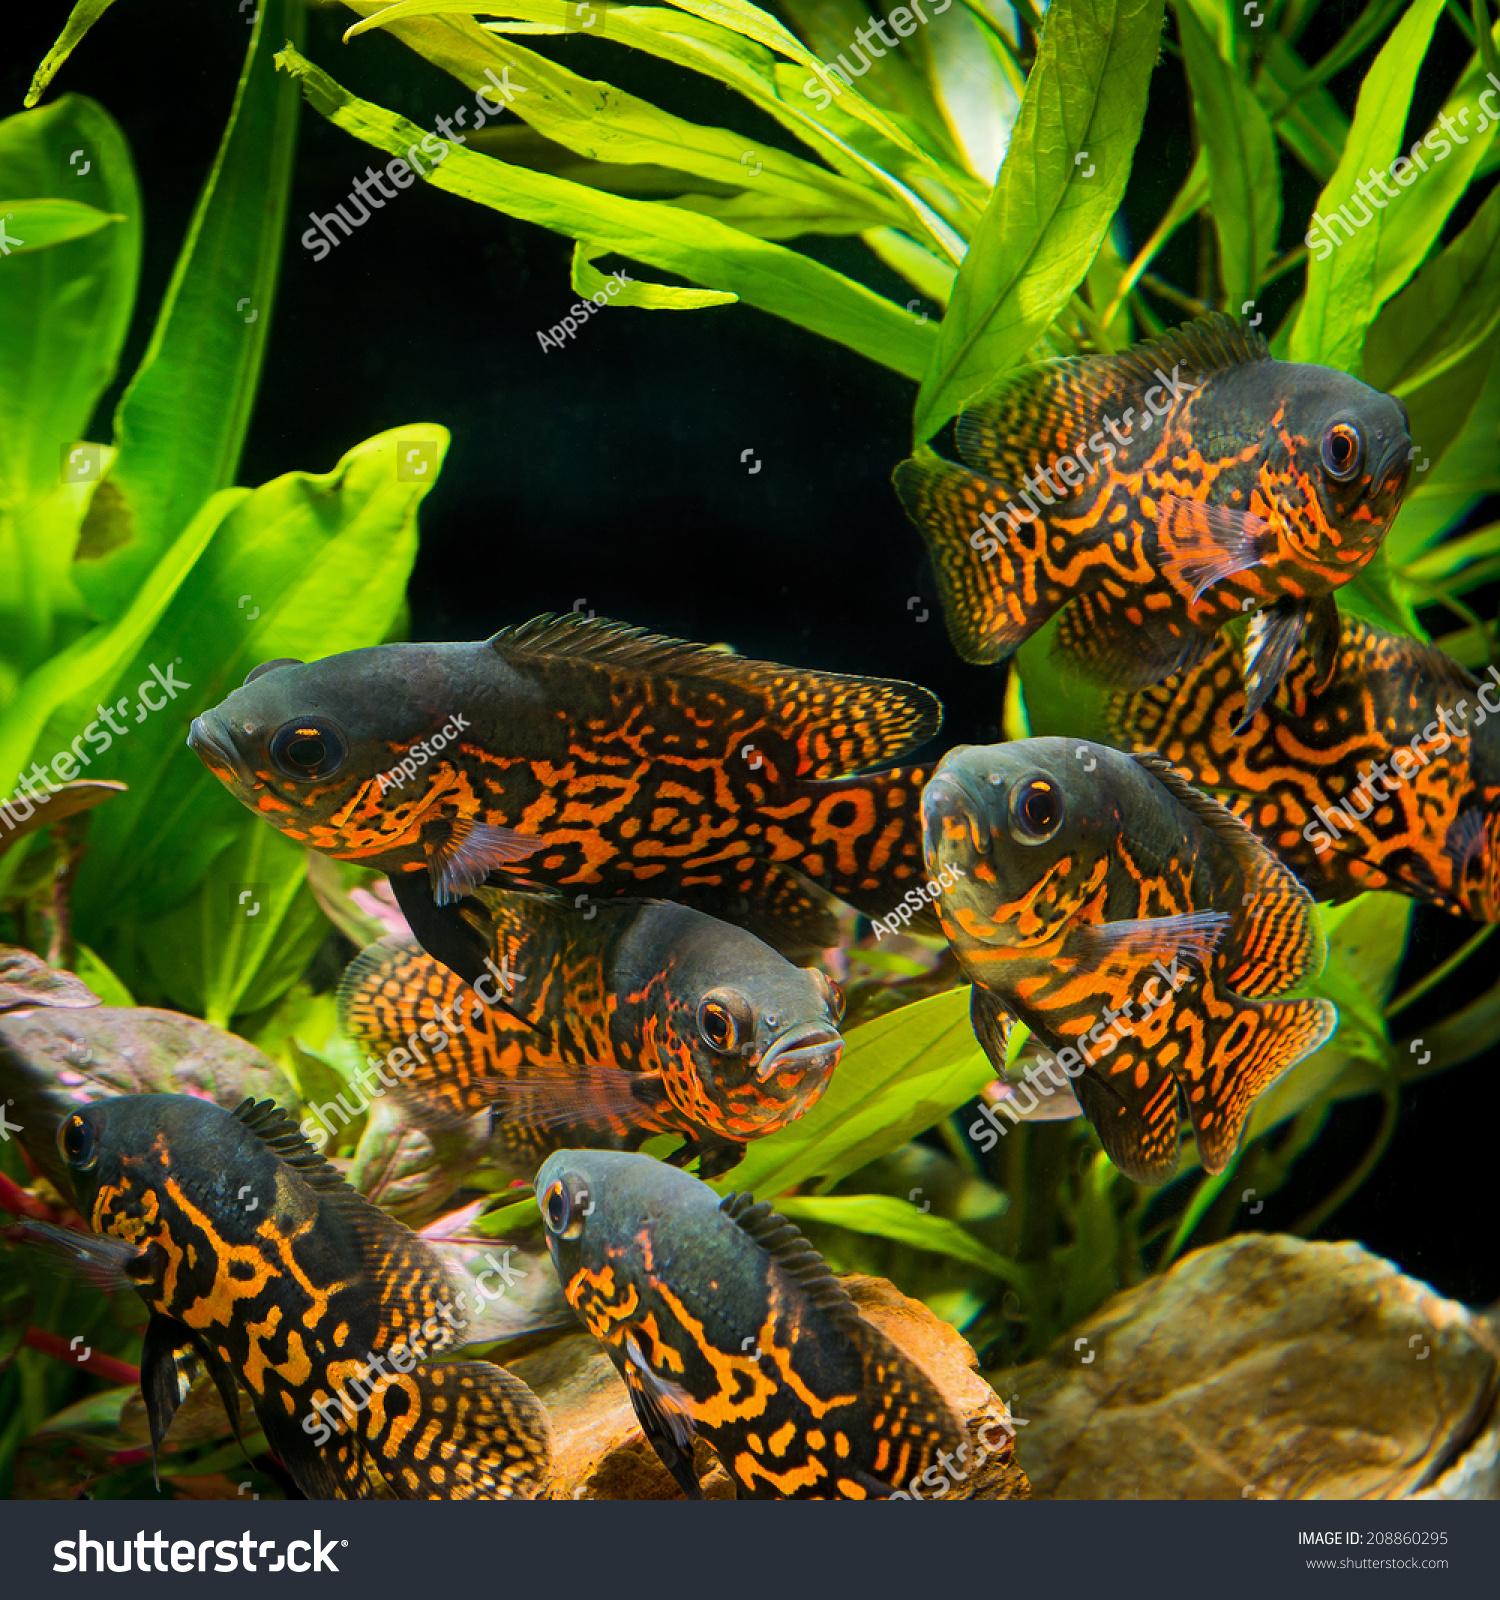 Fish aquarium oscar - Oscar Fish Astronotus Ocellatus Huge Cichlid Close Up Photo On Biotope